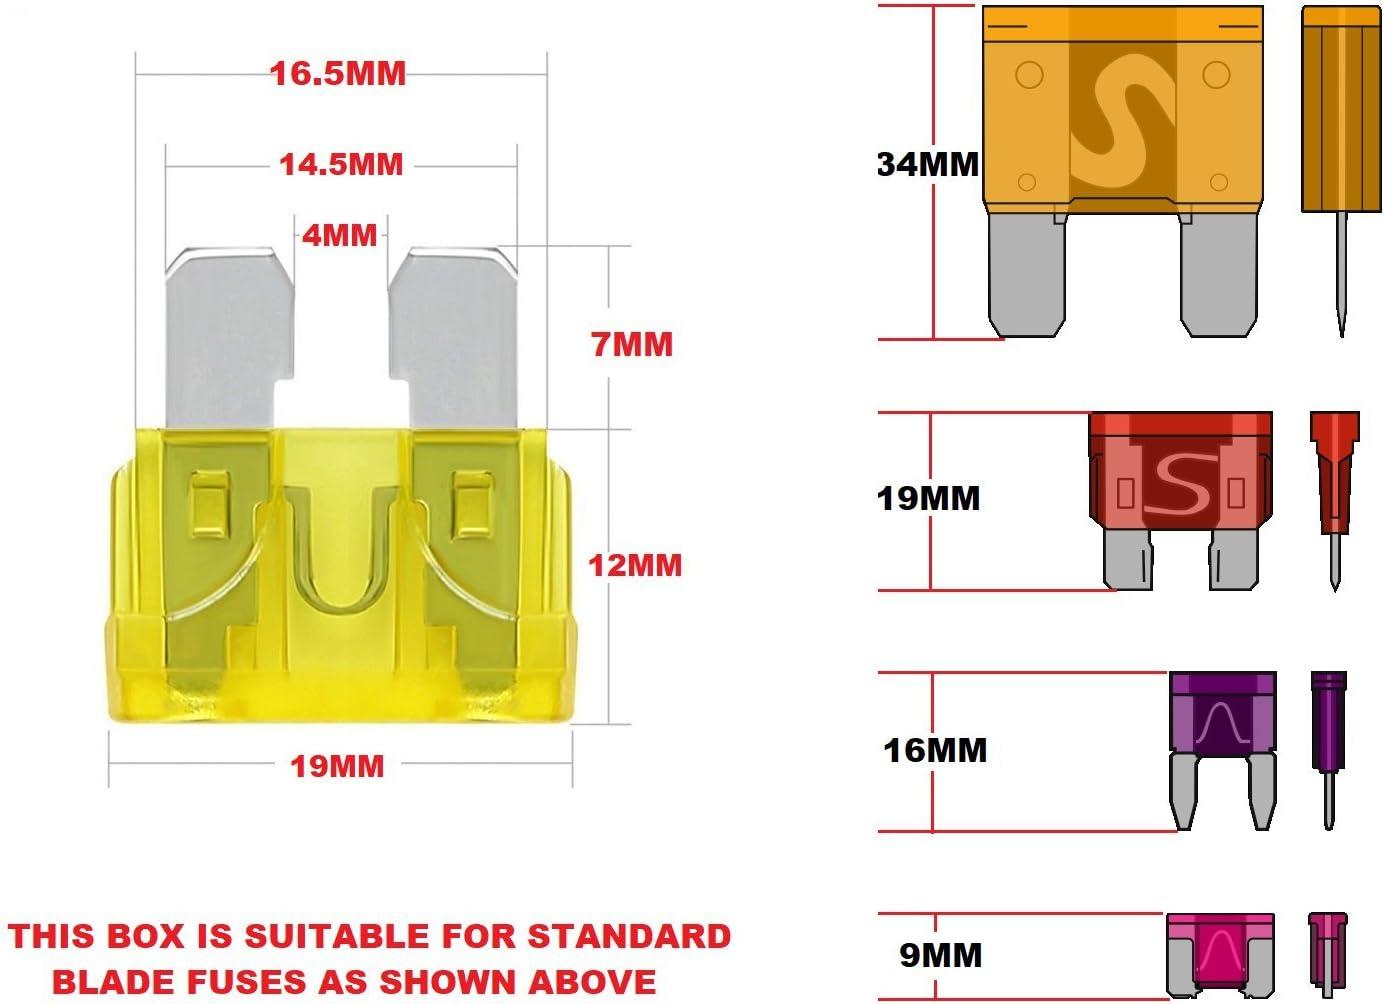 Renault MEGANE SALOON CAR BLADE MINI STANDARD FUSE BOX KIT 5 10 15 20 25 30 AMP